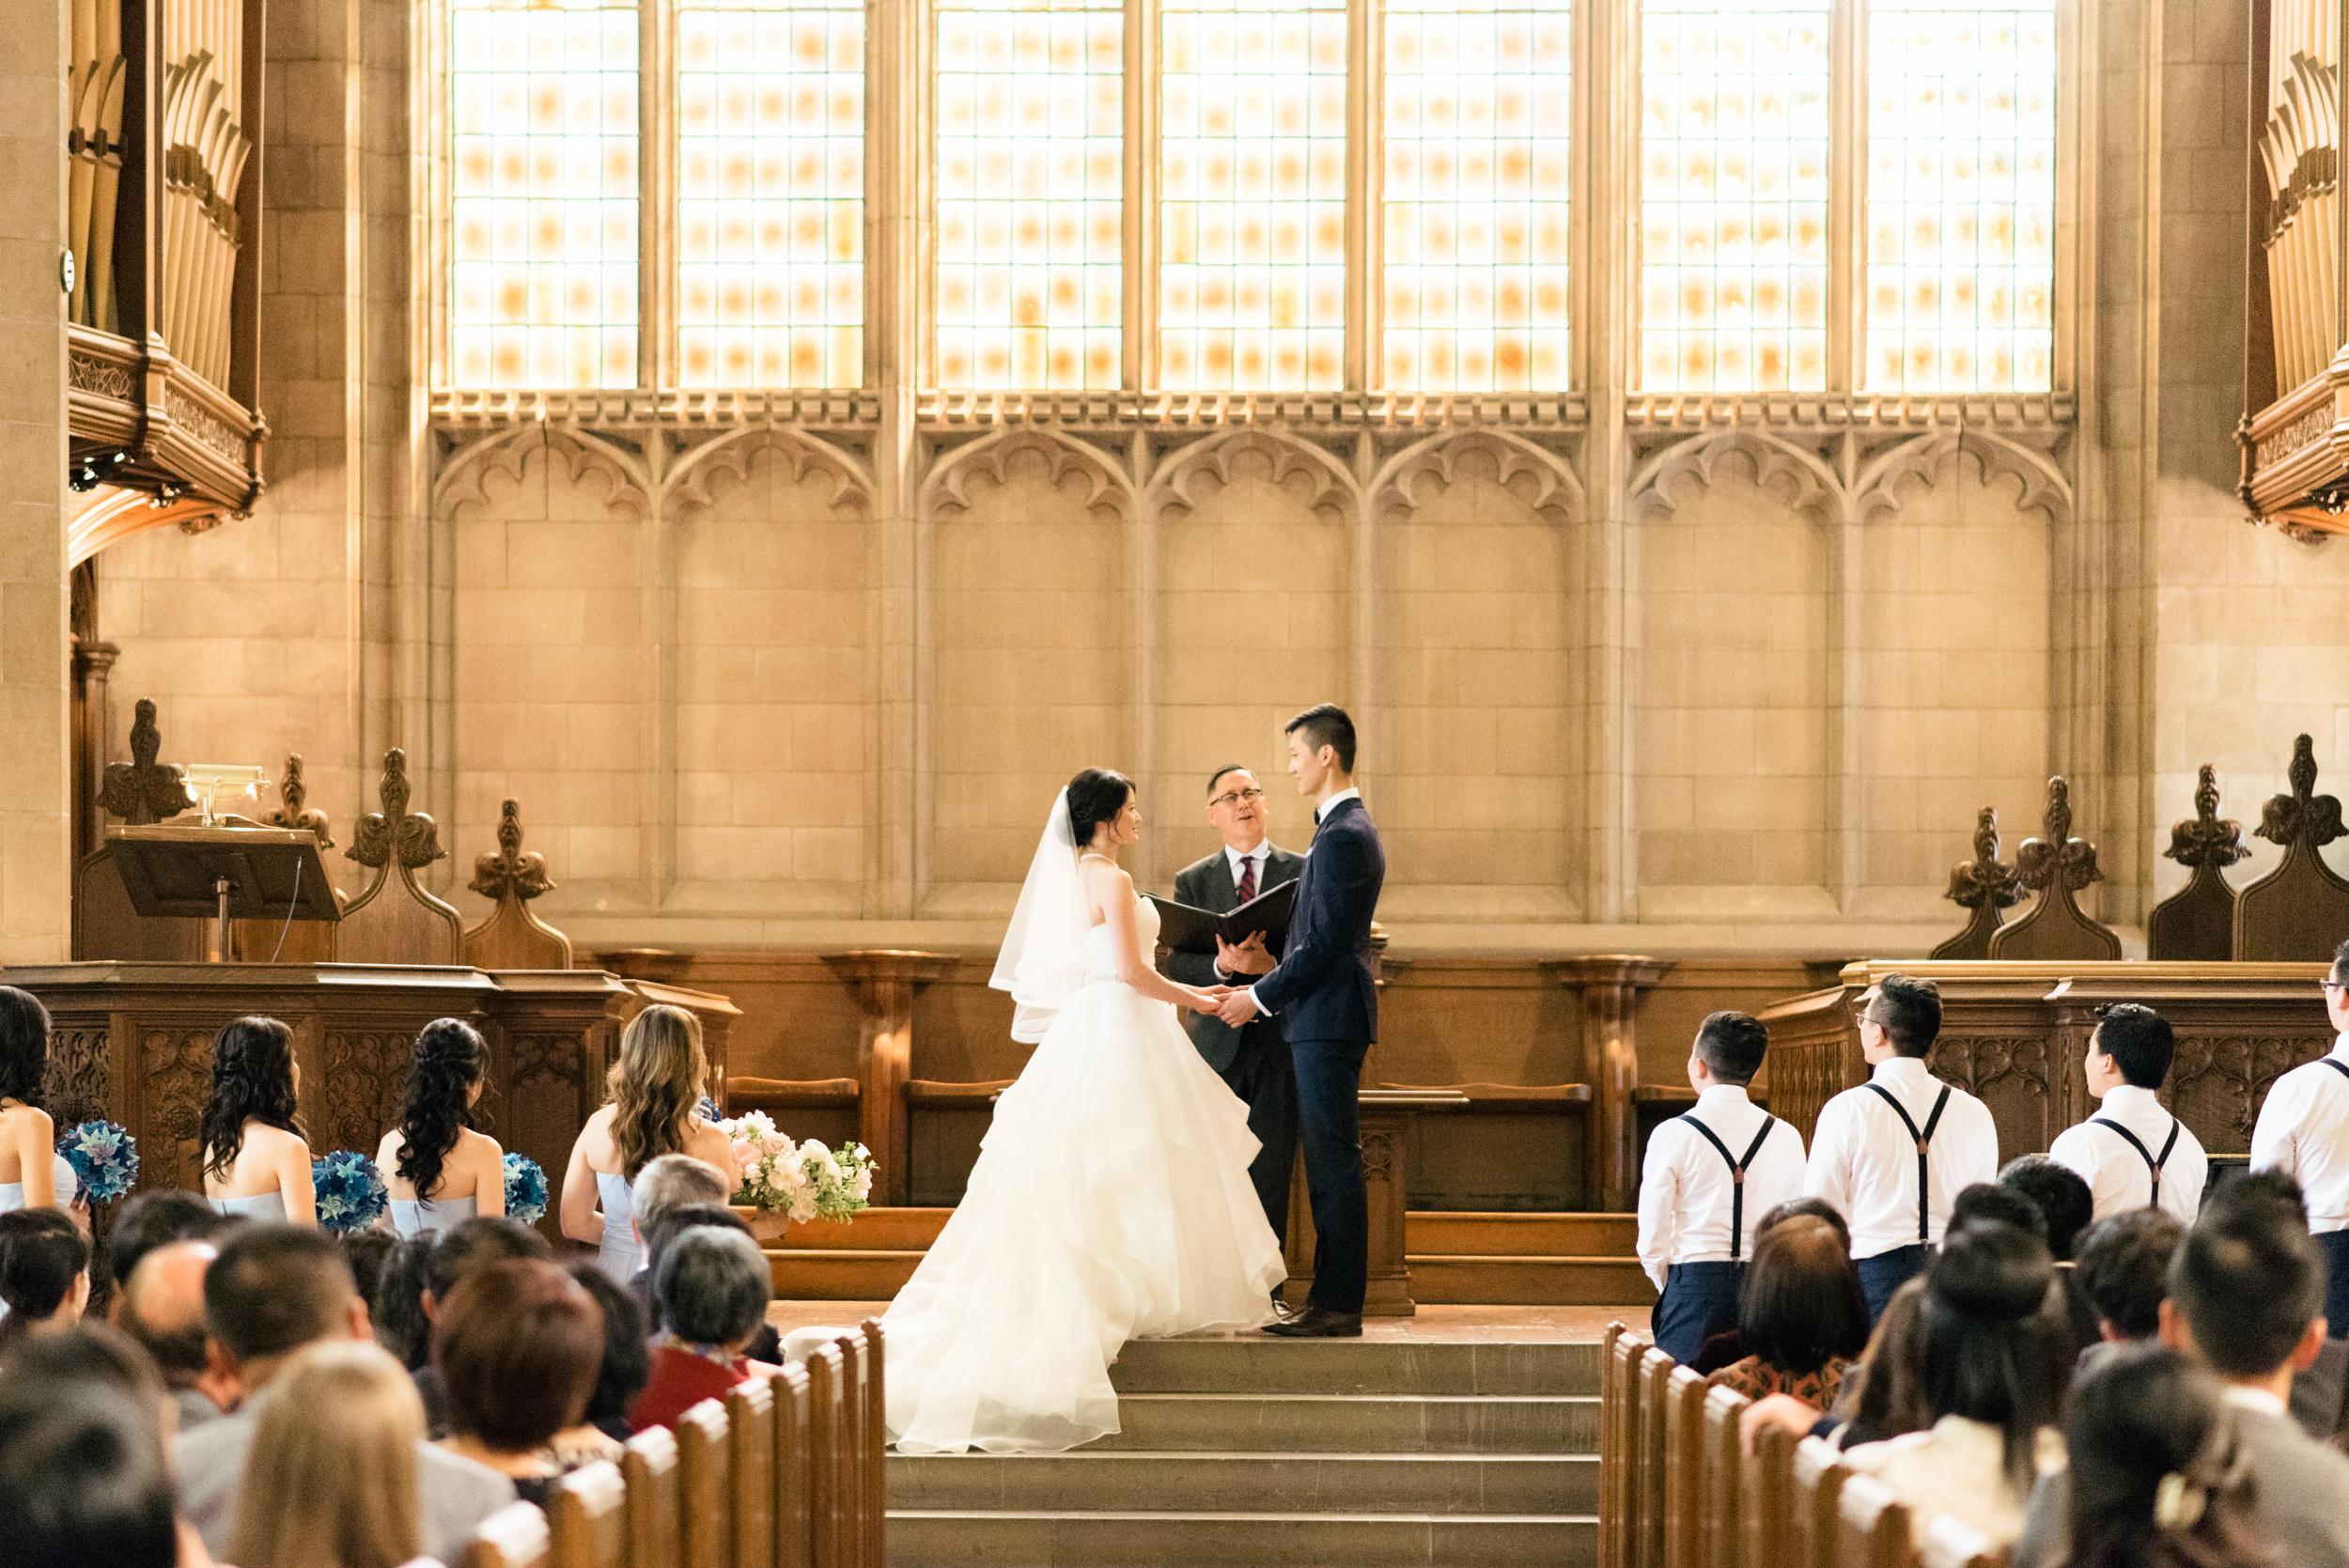 knox-college-wedding-136.jpg